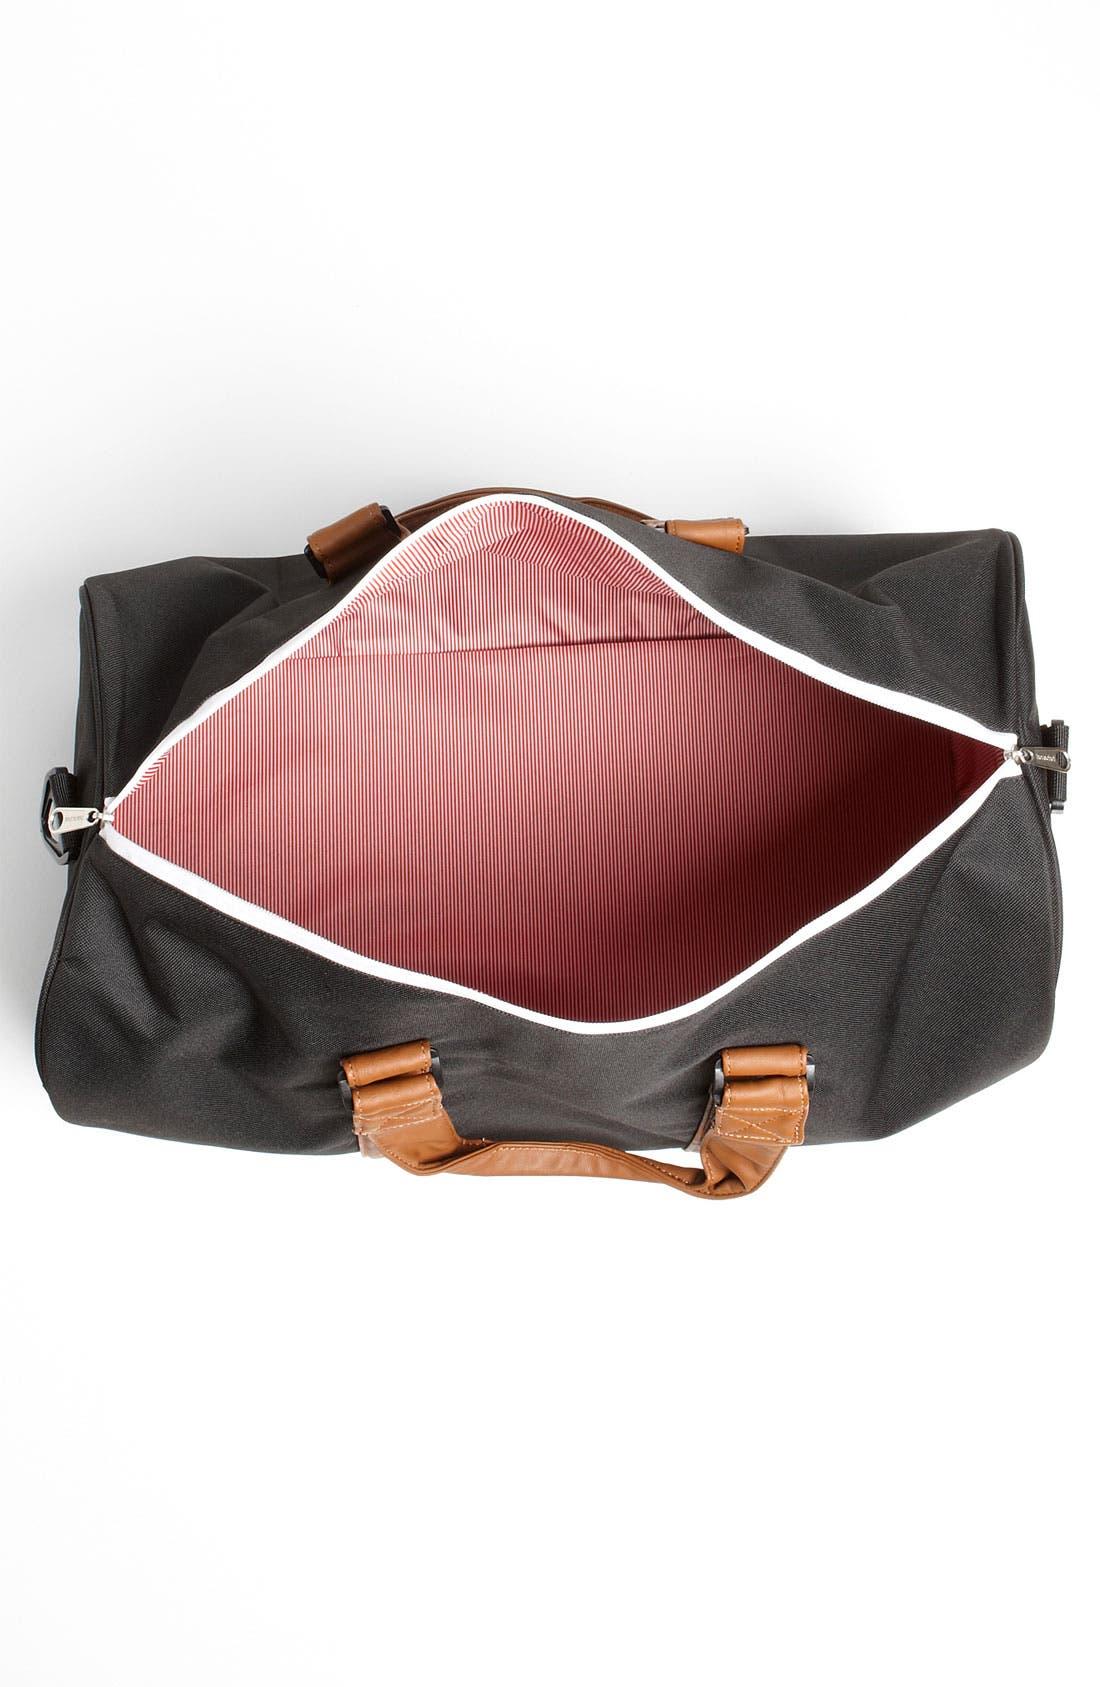 'Novel' Duffel Bag,                             Alternate thumbnail 9, color,                             BLACK/ TAN